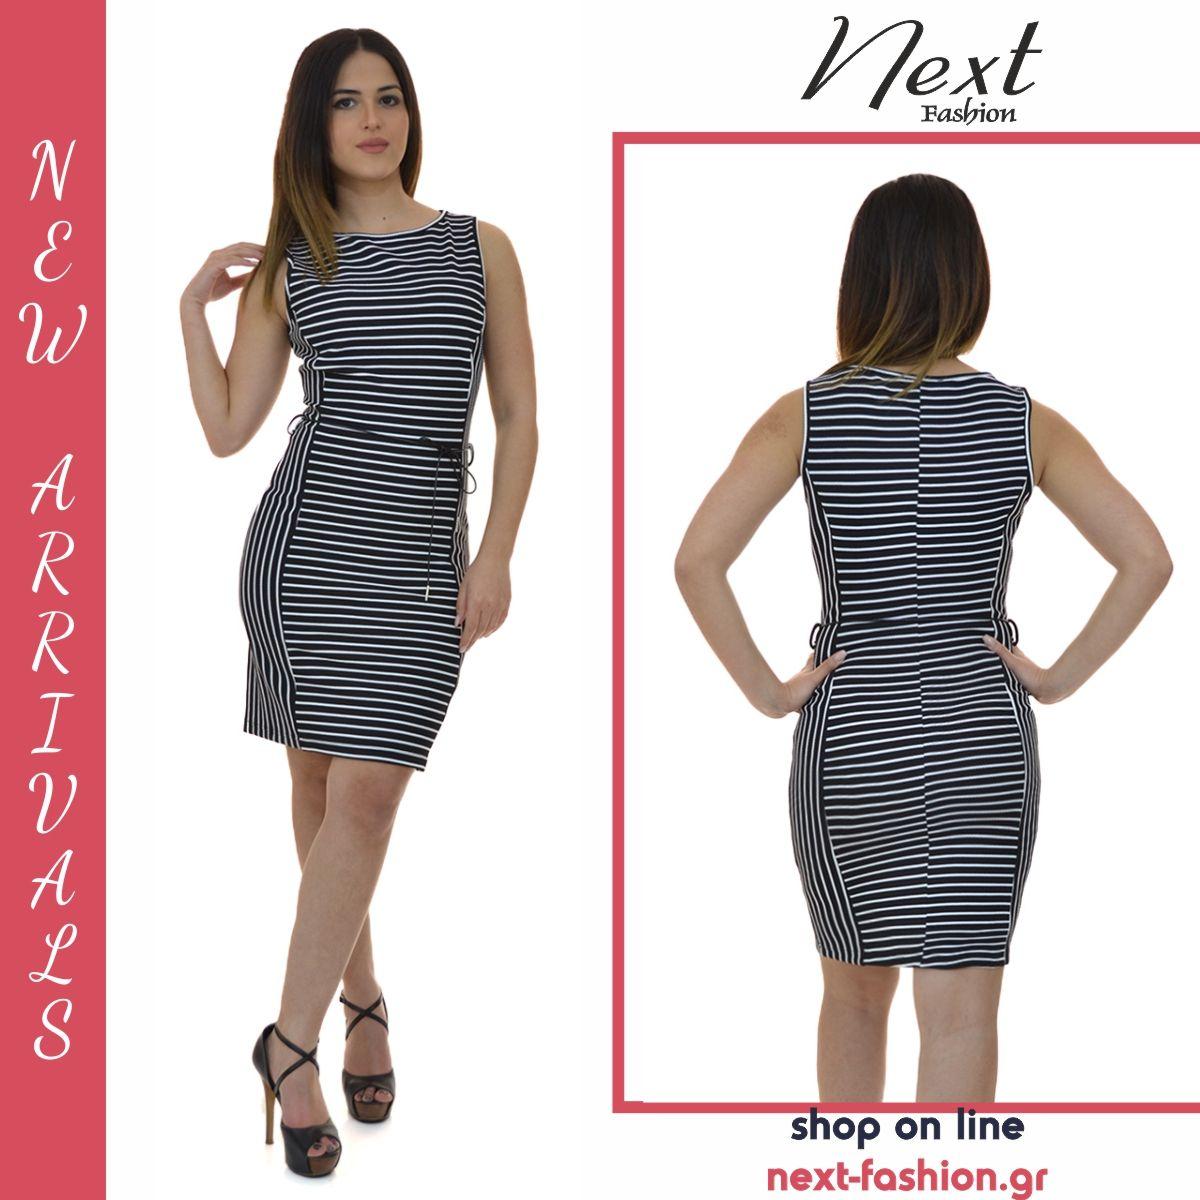 9857ef5ea702 Next fashion. Φόρεμα Midi Ριγέ με Ζωνάκι